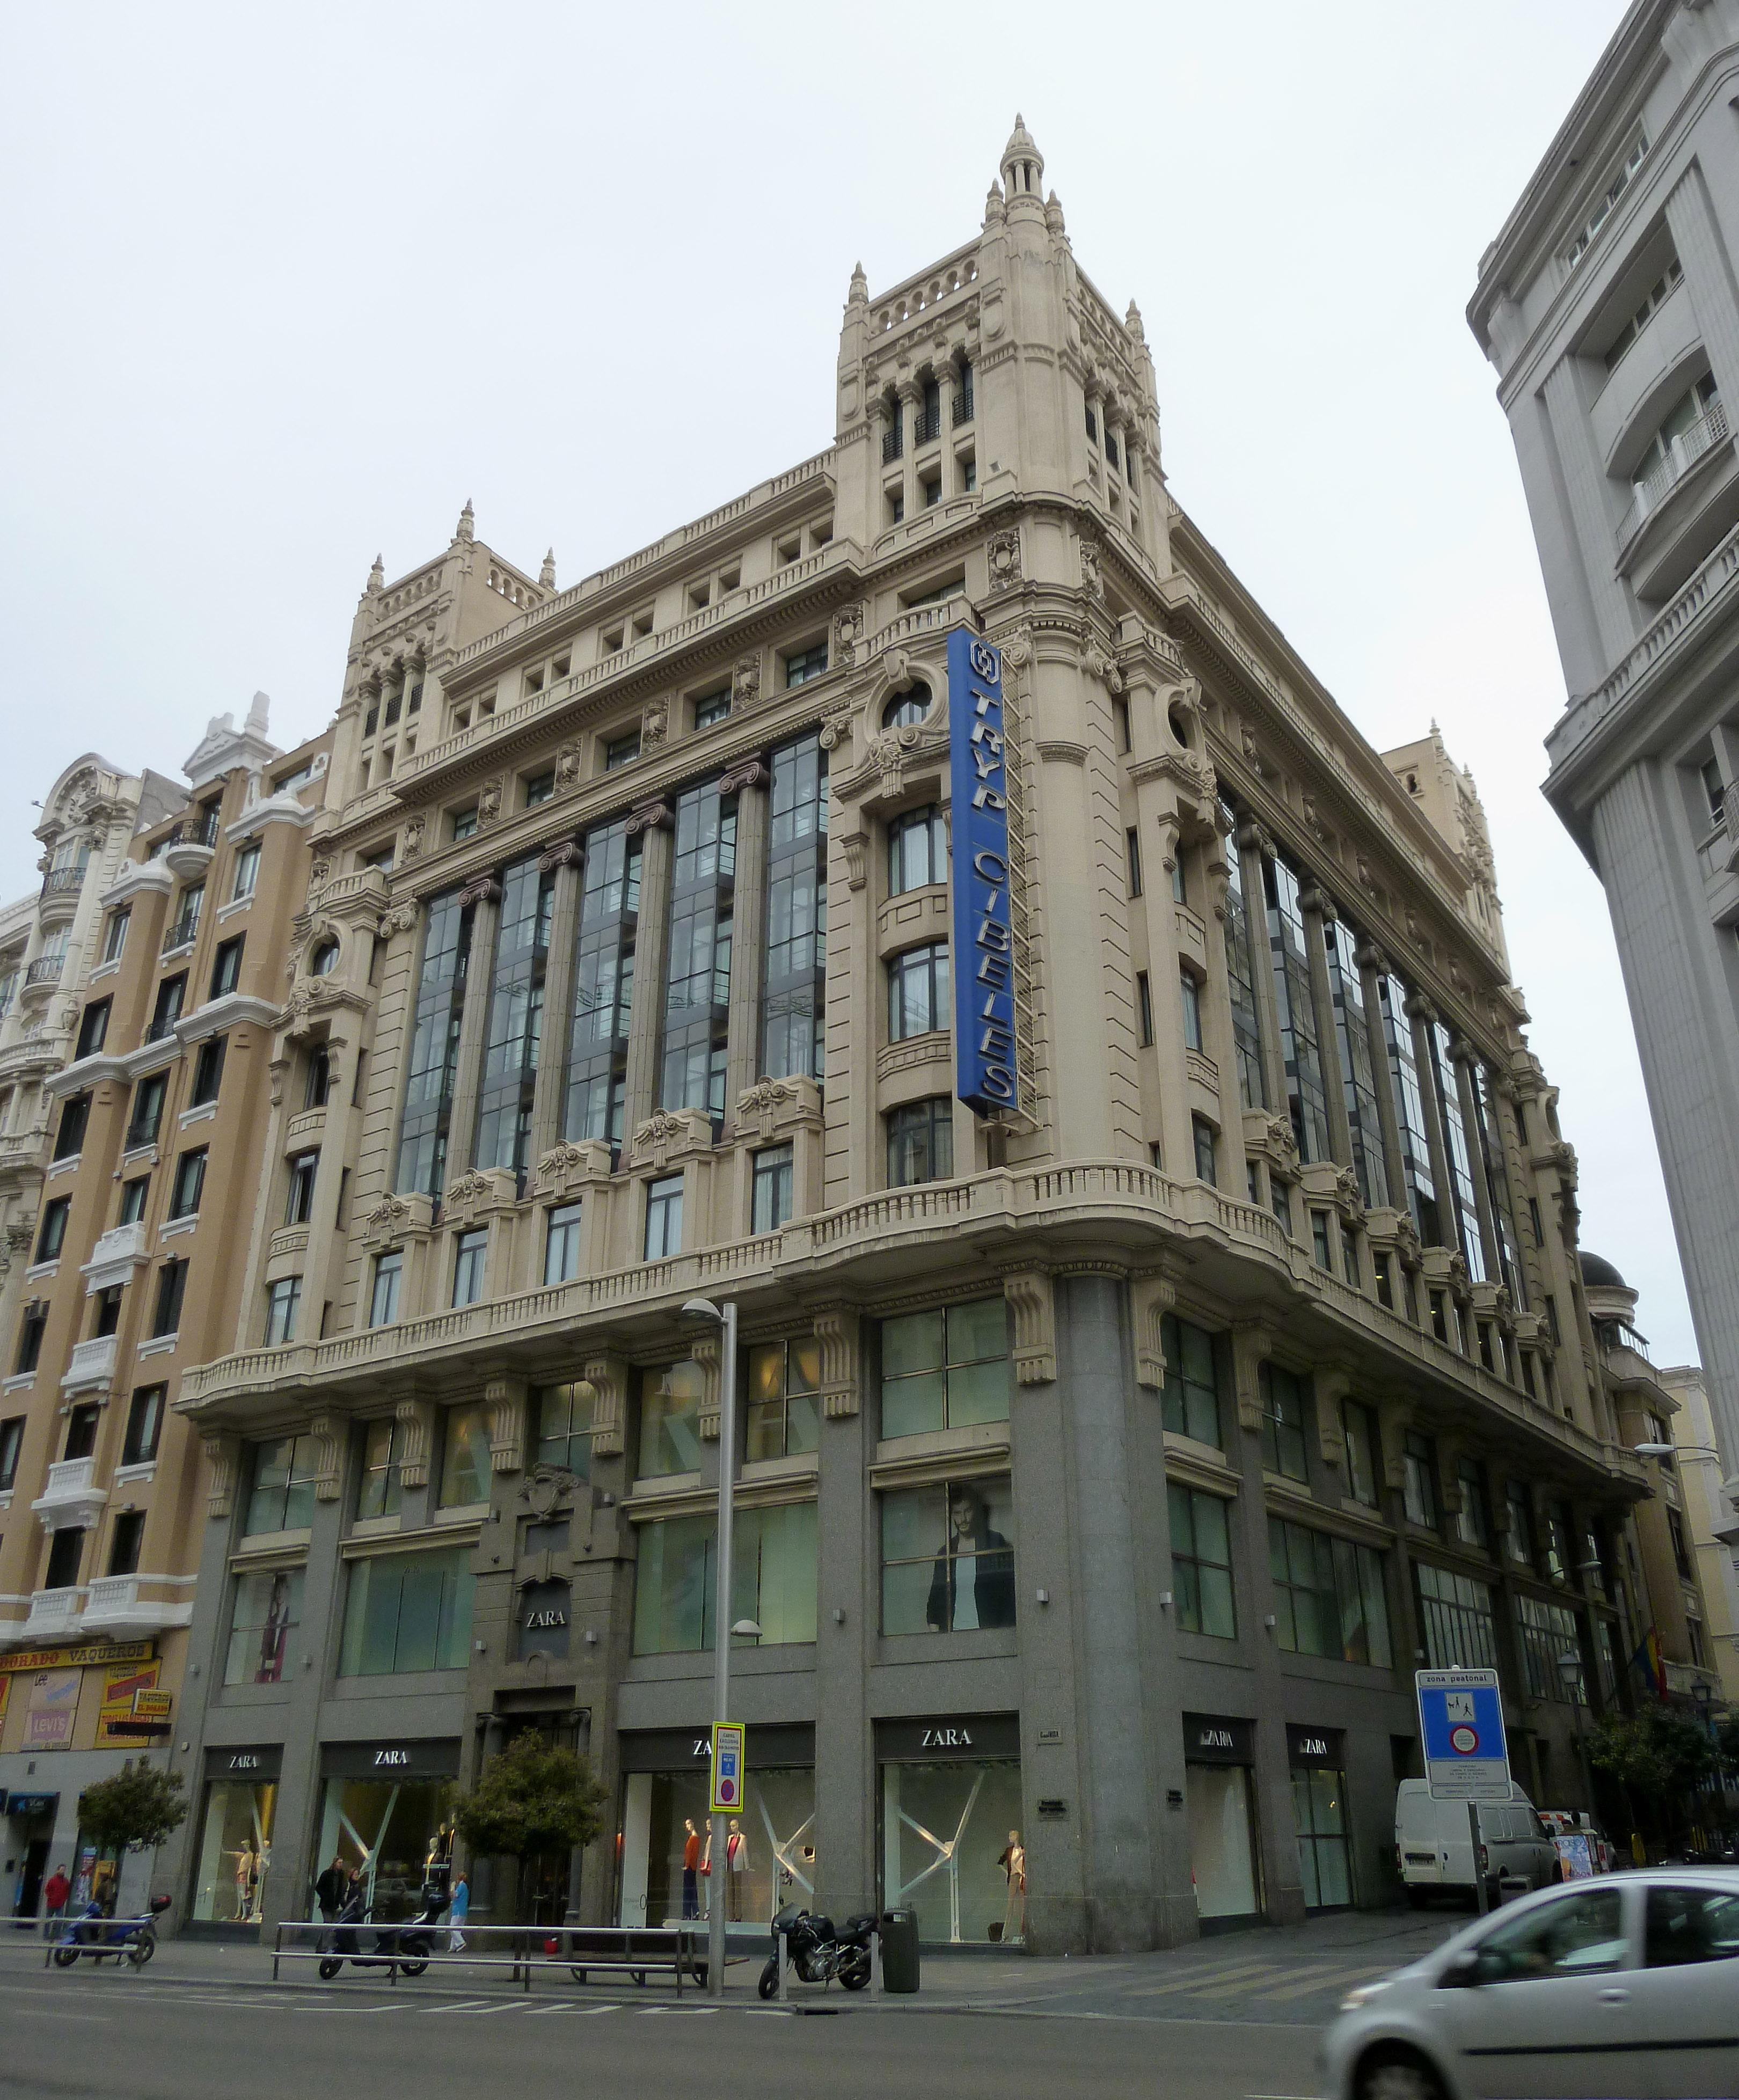 Archivo hotel tryp cibeles gran v a 34 madrid wikipedia la enciclopedia libre - One shot hotels madrid ...